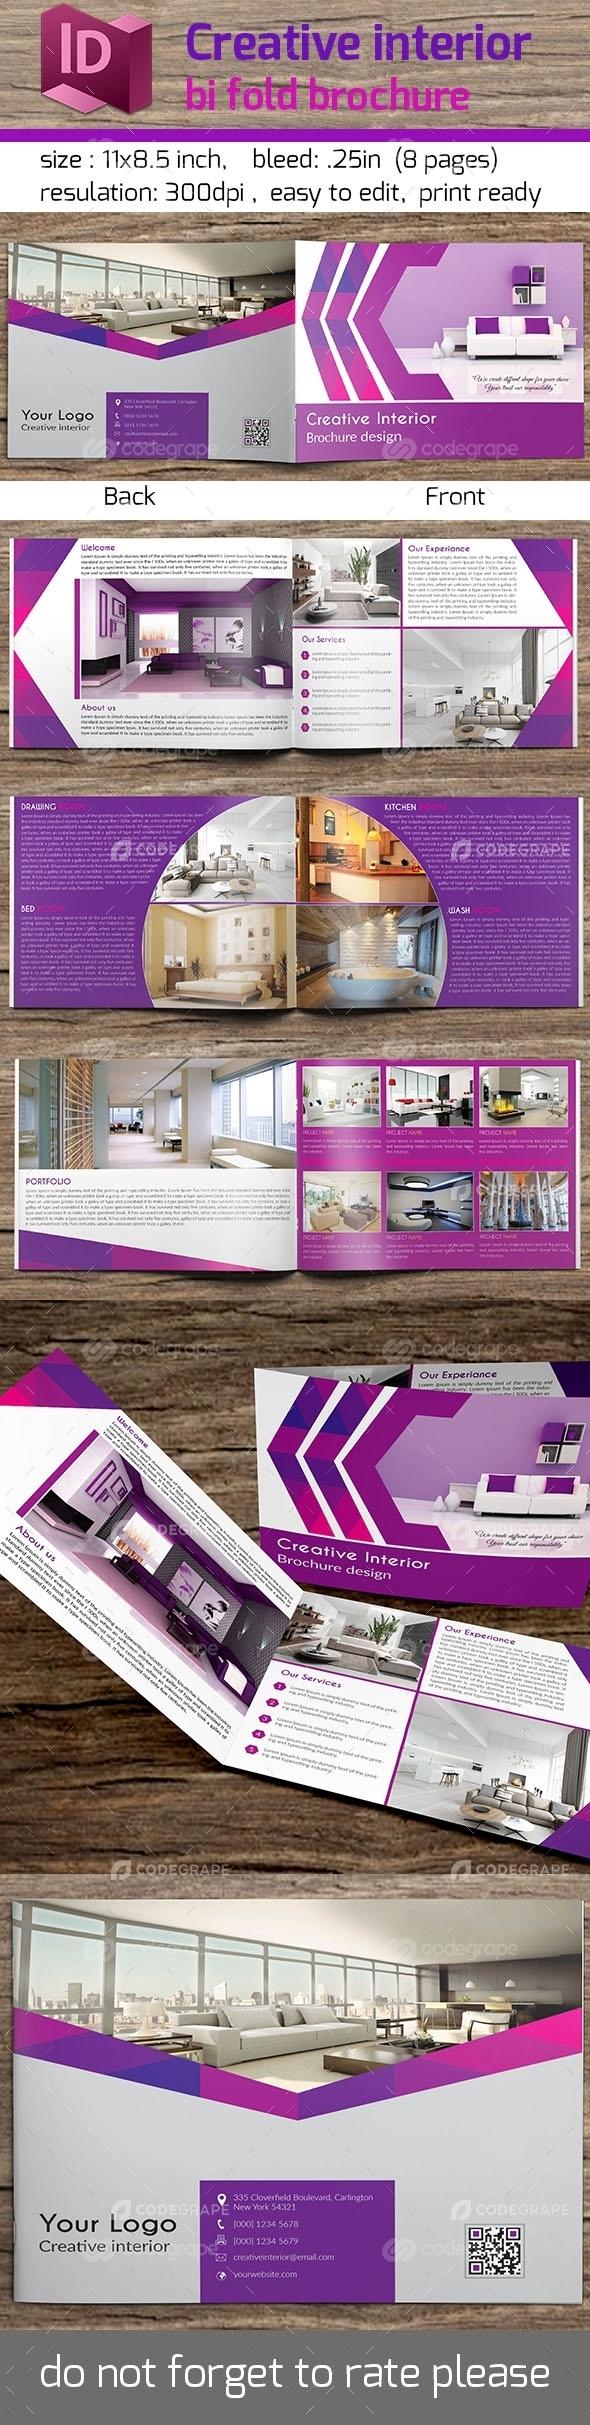 Creative Interior Bi Fold Brochure